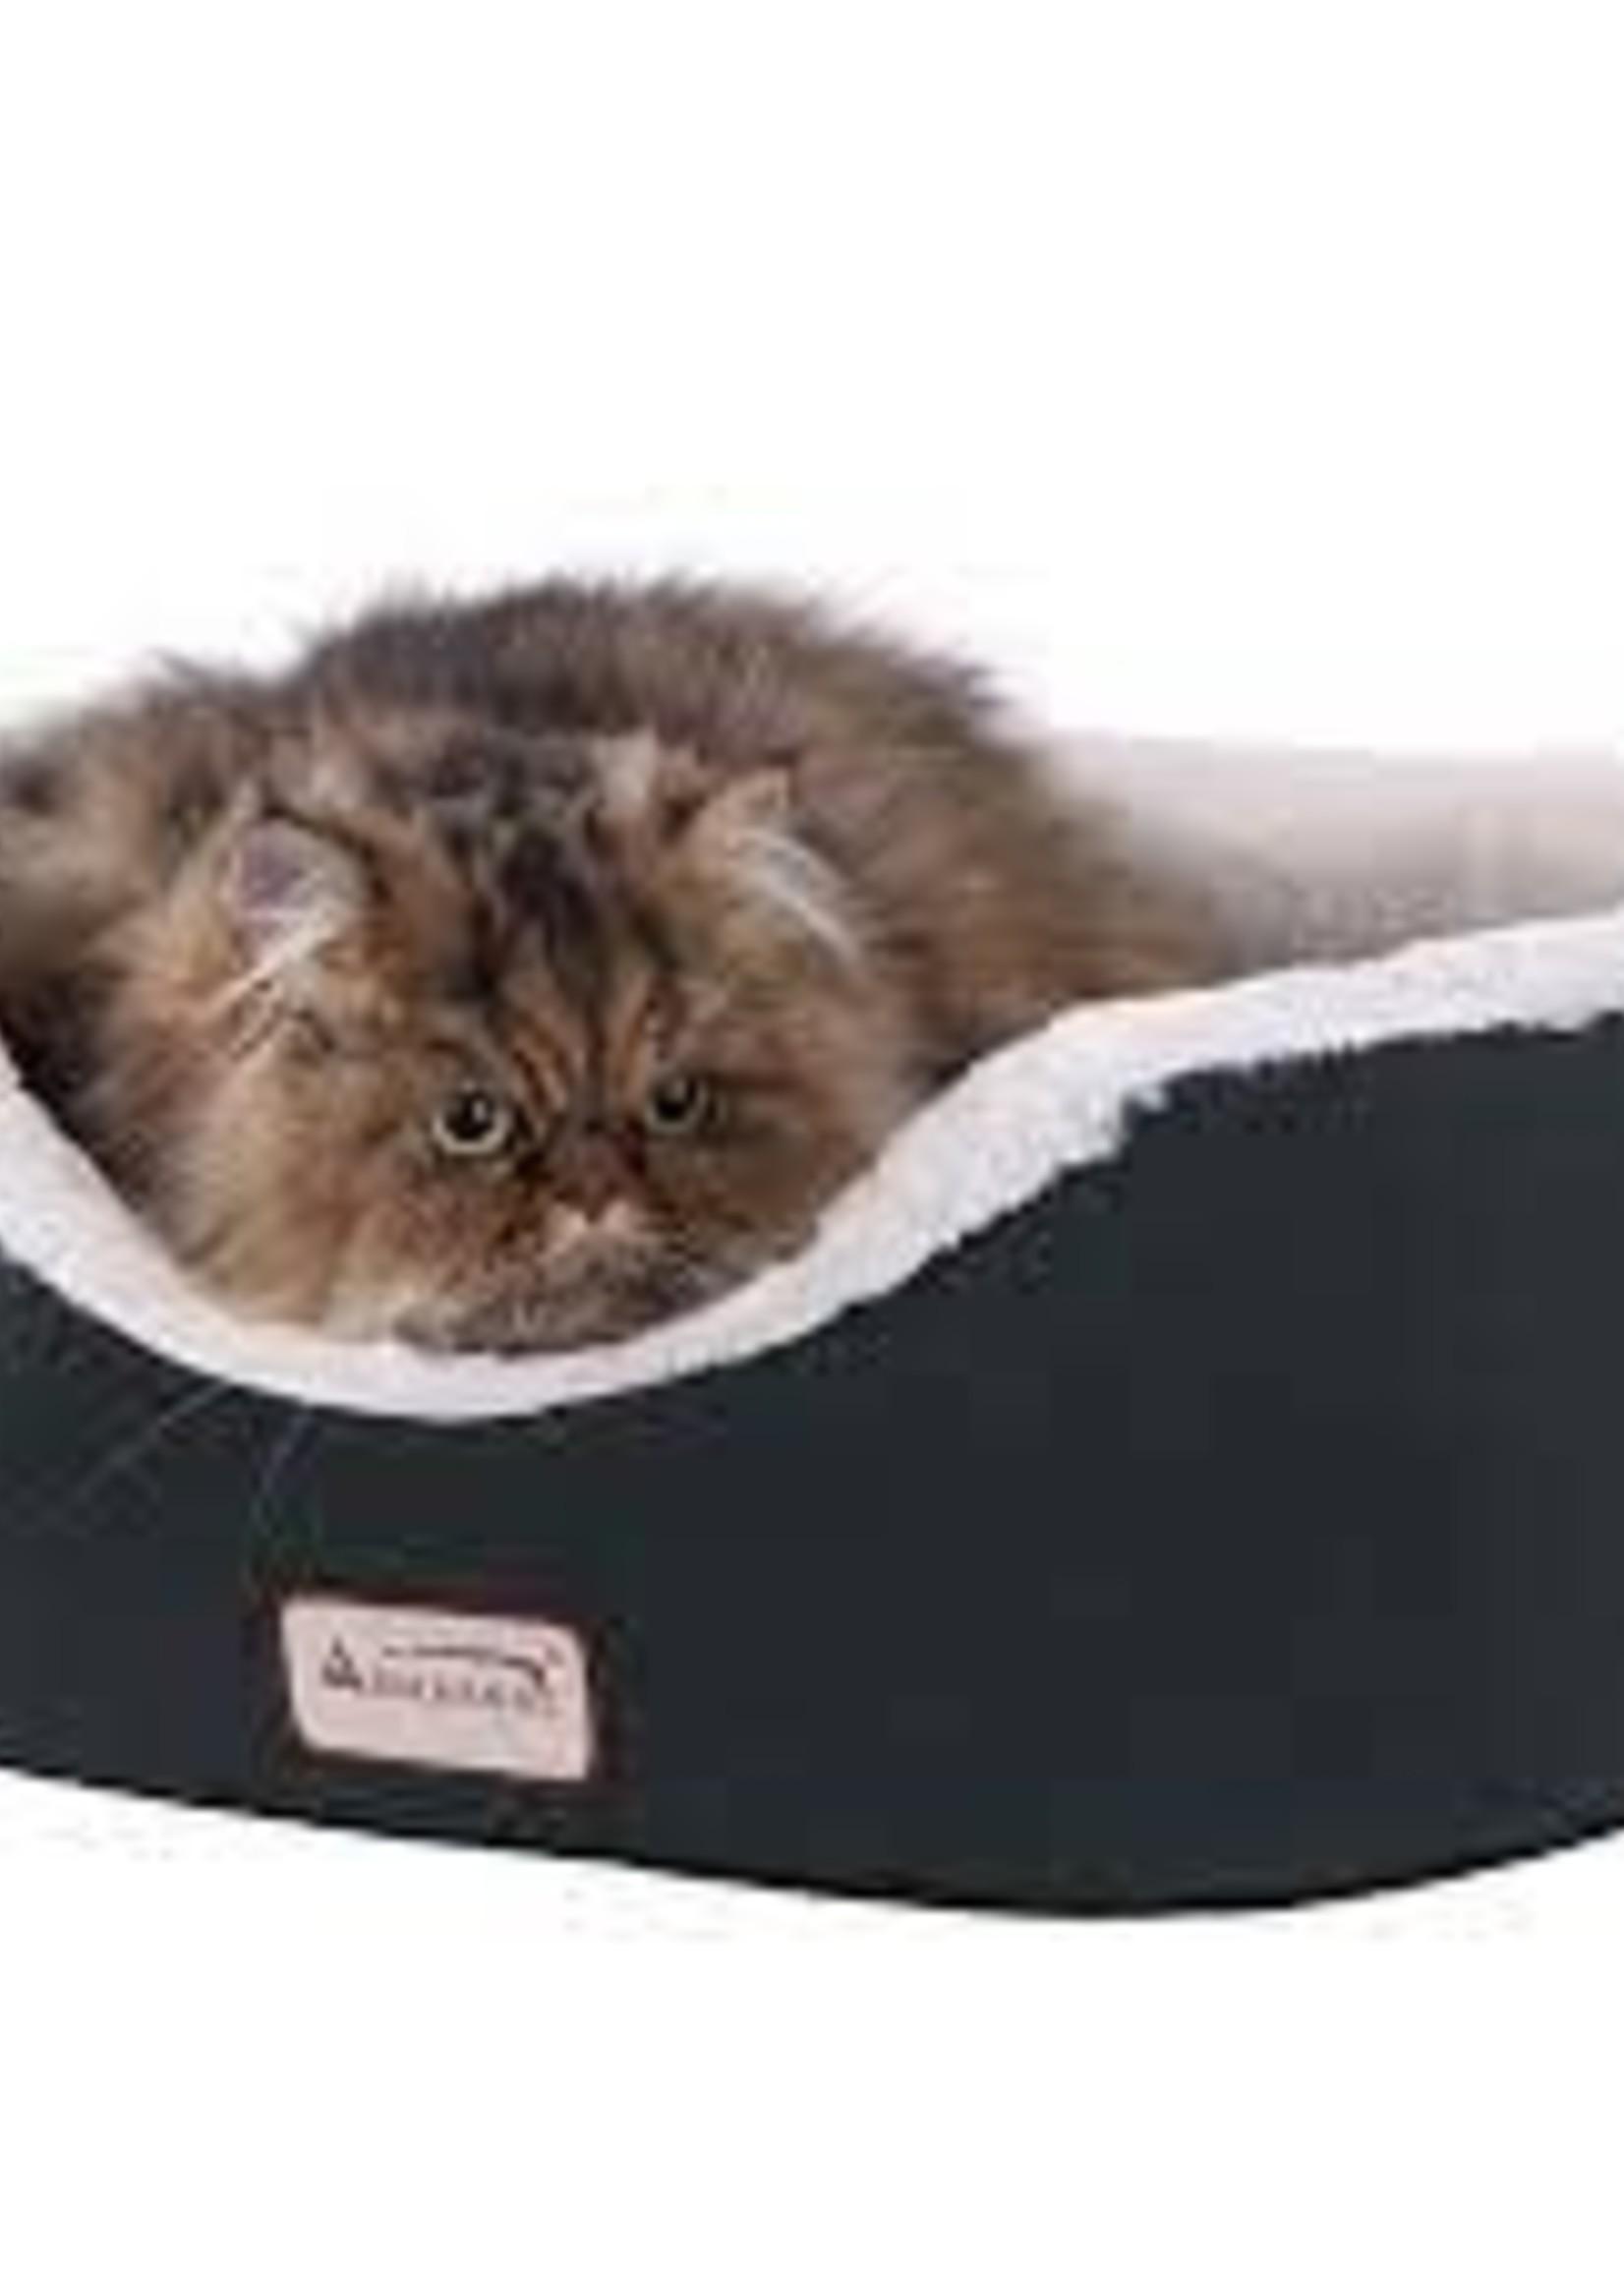 Armarkat Armarkat Cat Bed Oval Pet Cuddle House, Laurel Green/Ivory